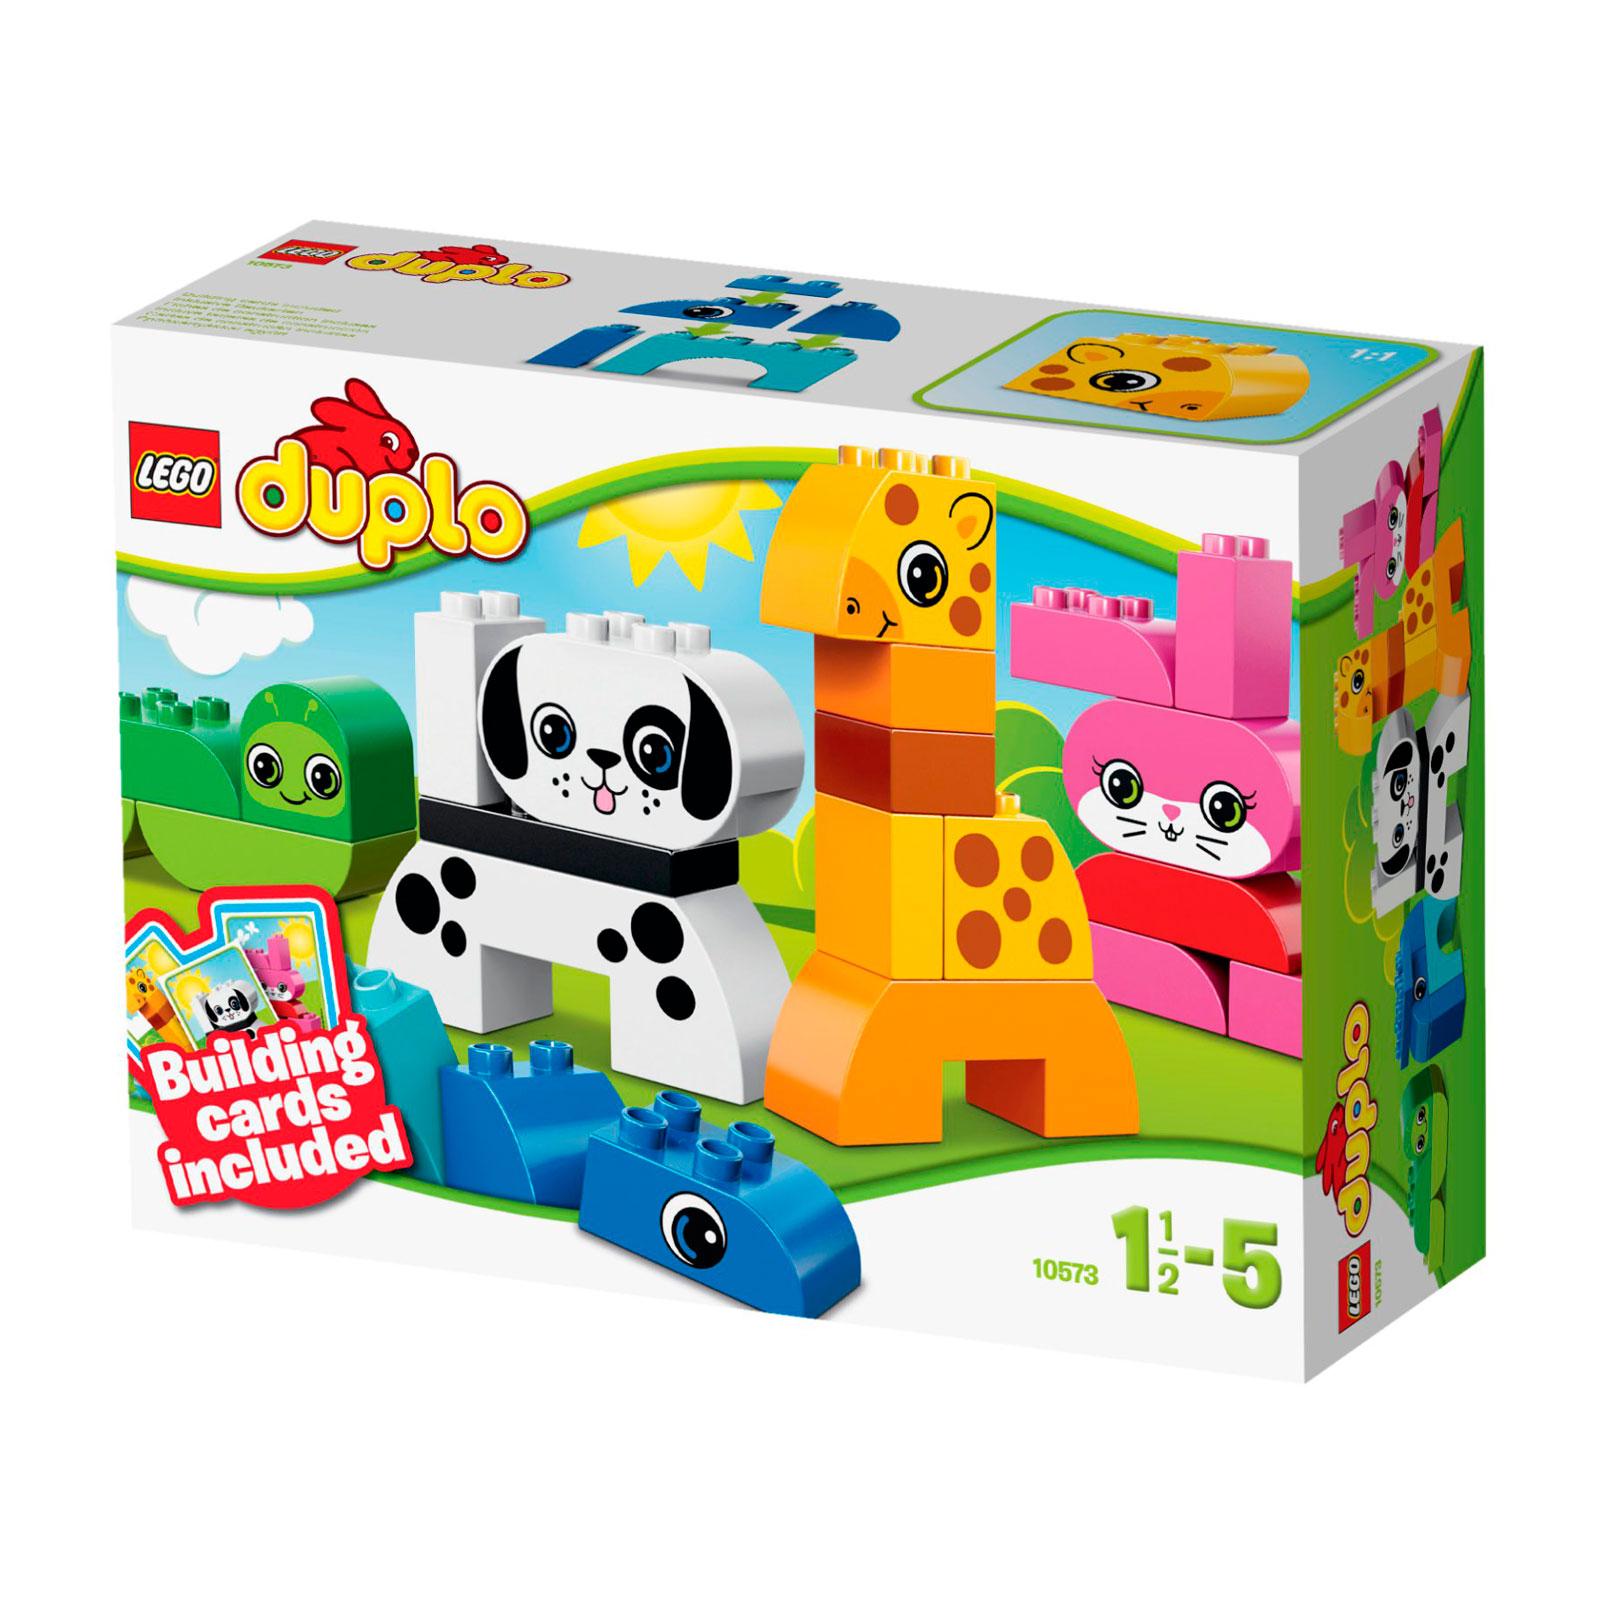 ����������� LEGO Duplo 10573 ������ ��������